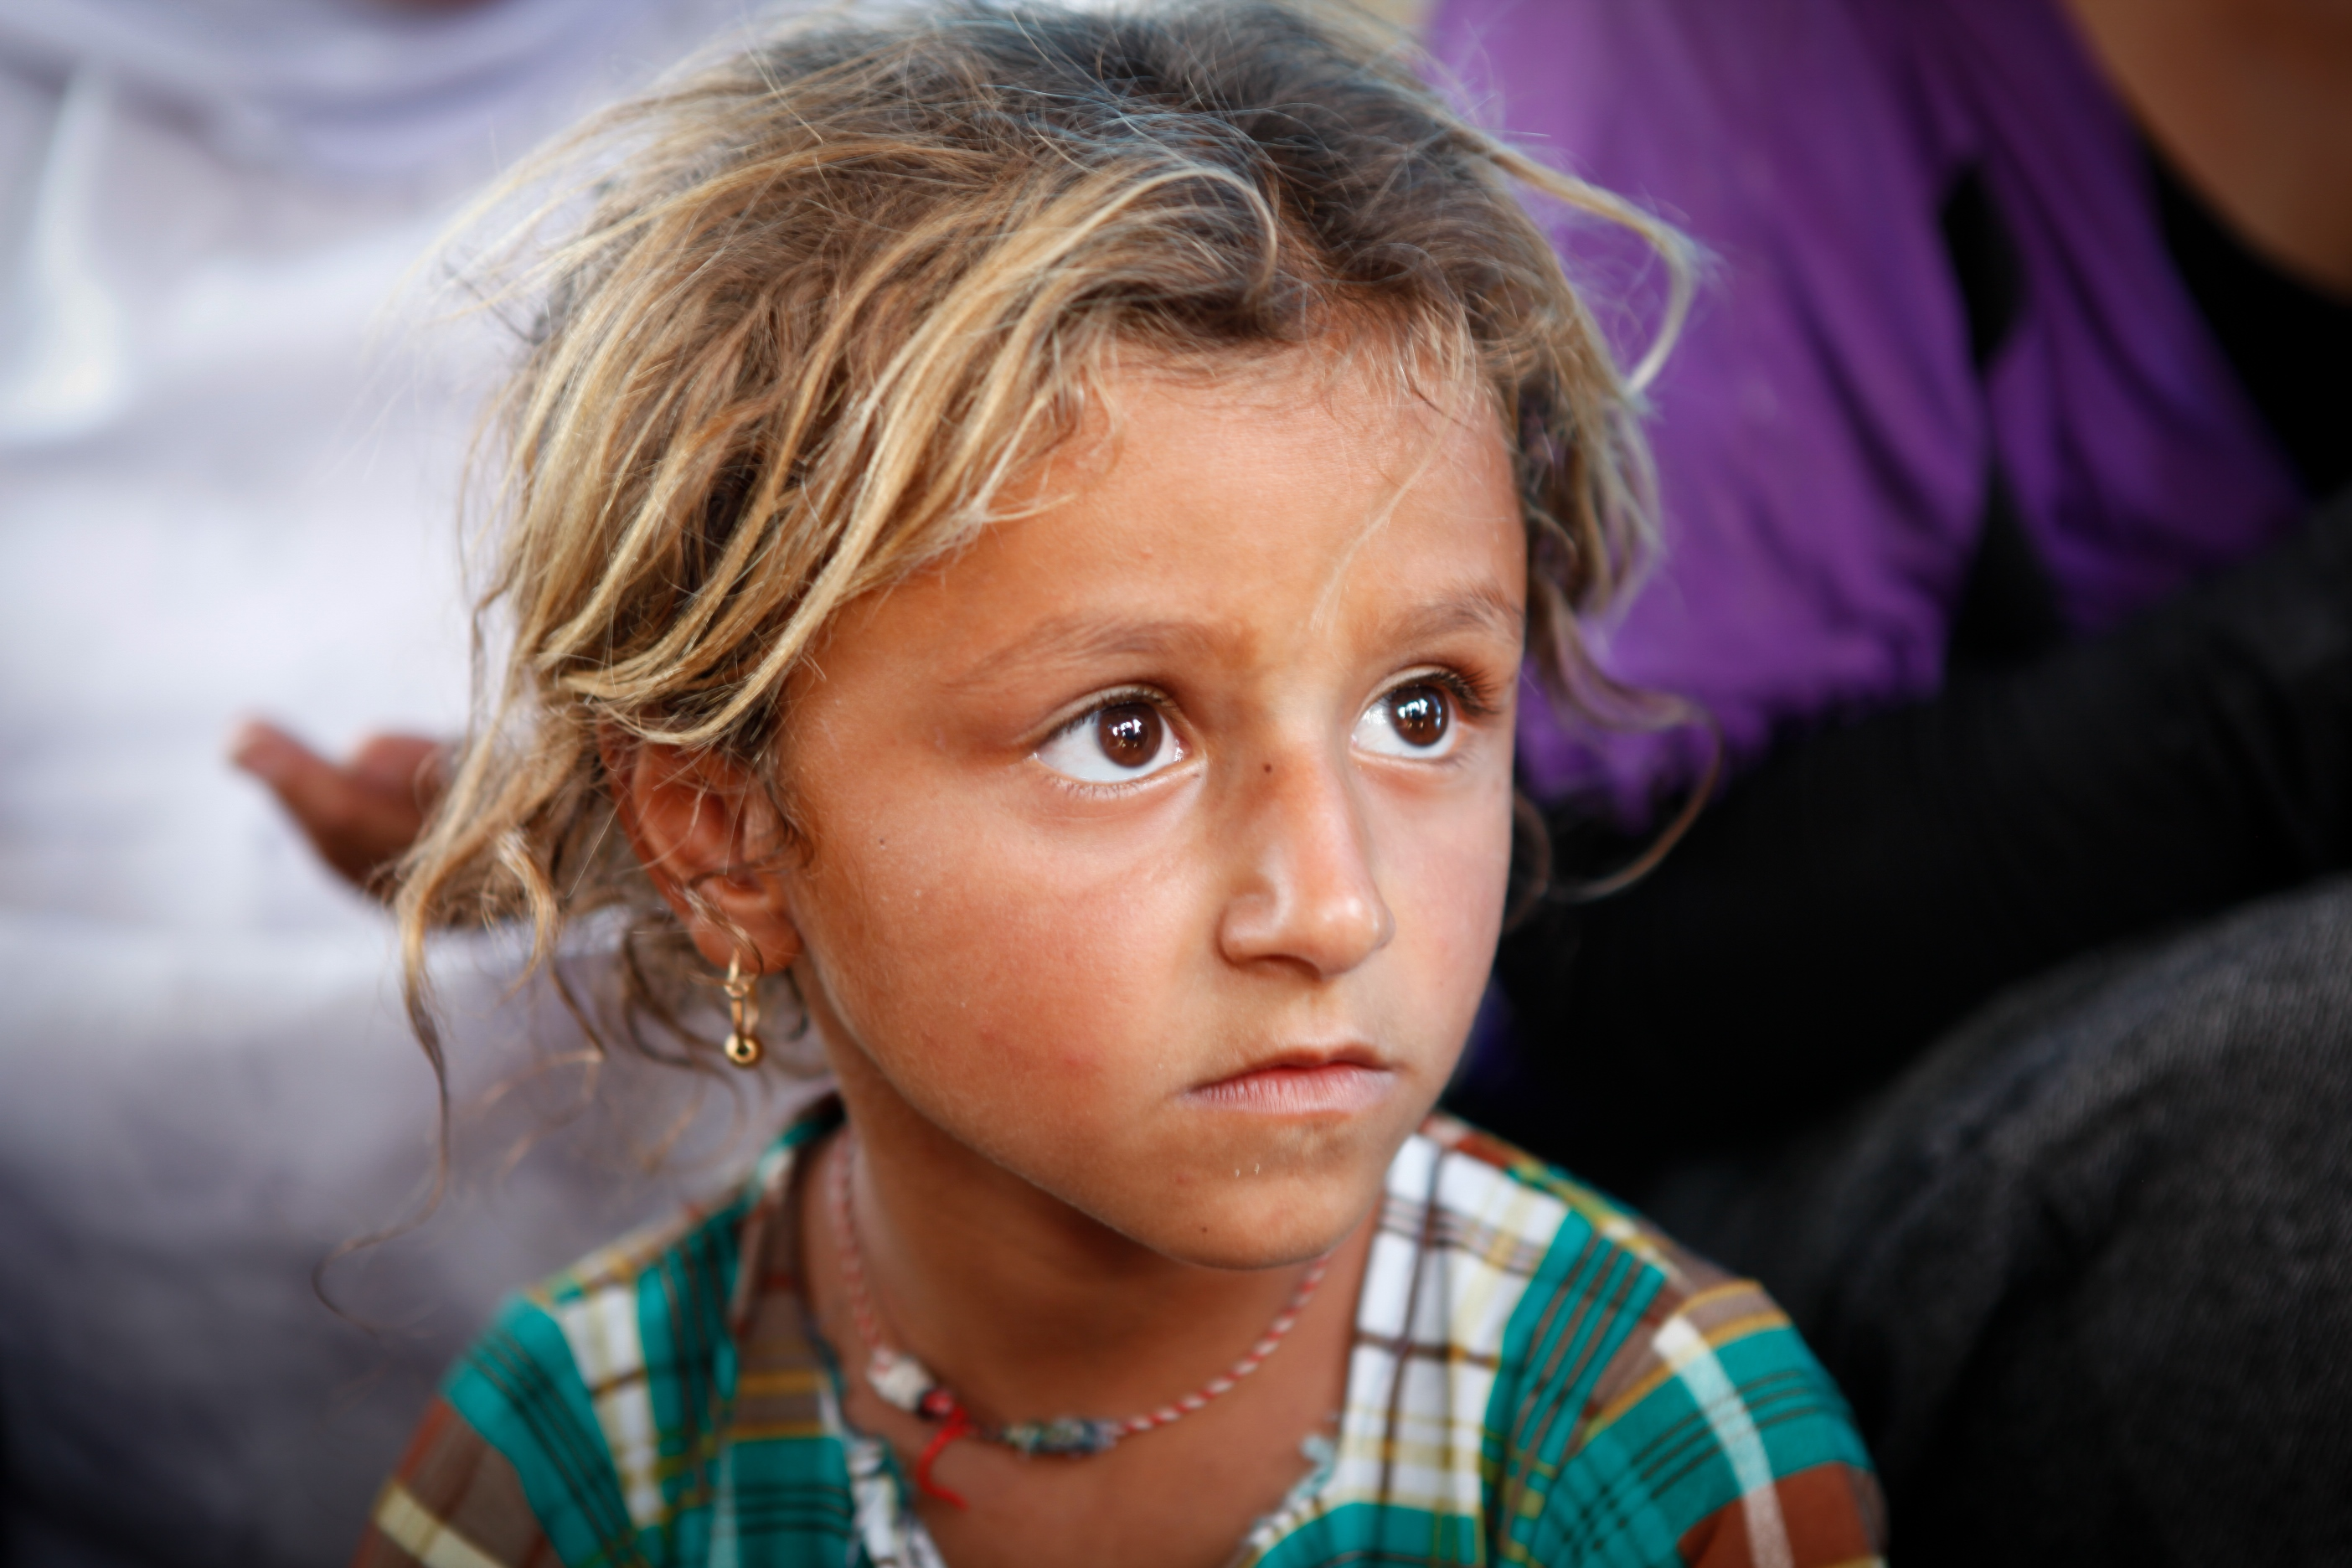 Who Will Rebuild Syria? Invest in Syria's children.